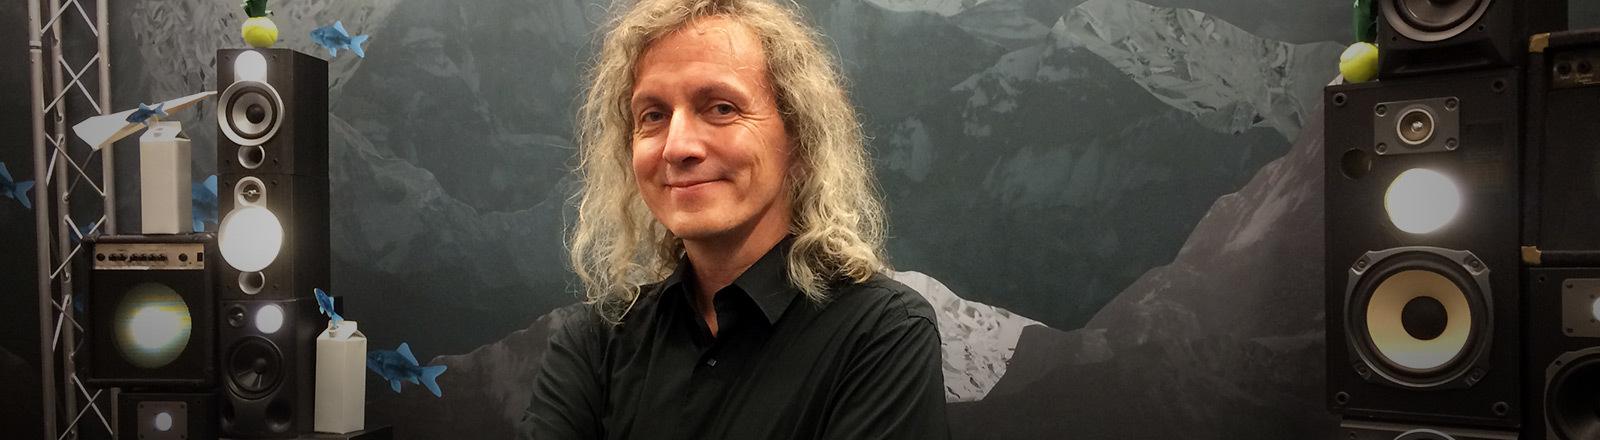 Parfümeur Uwe Manasse im Deutschlandfunk-Nova-Studio